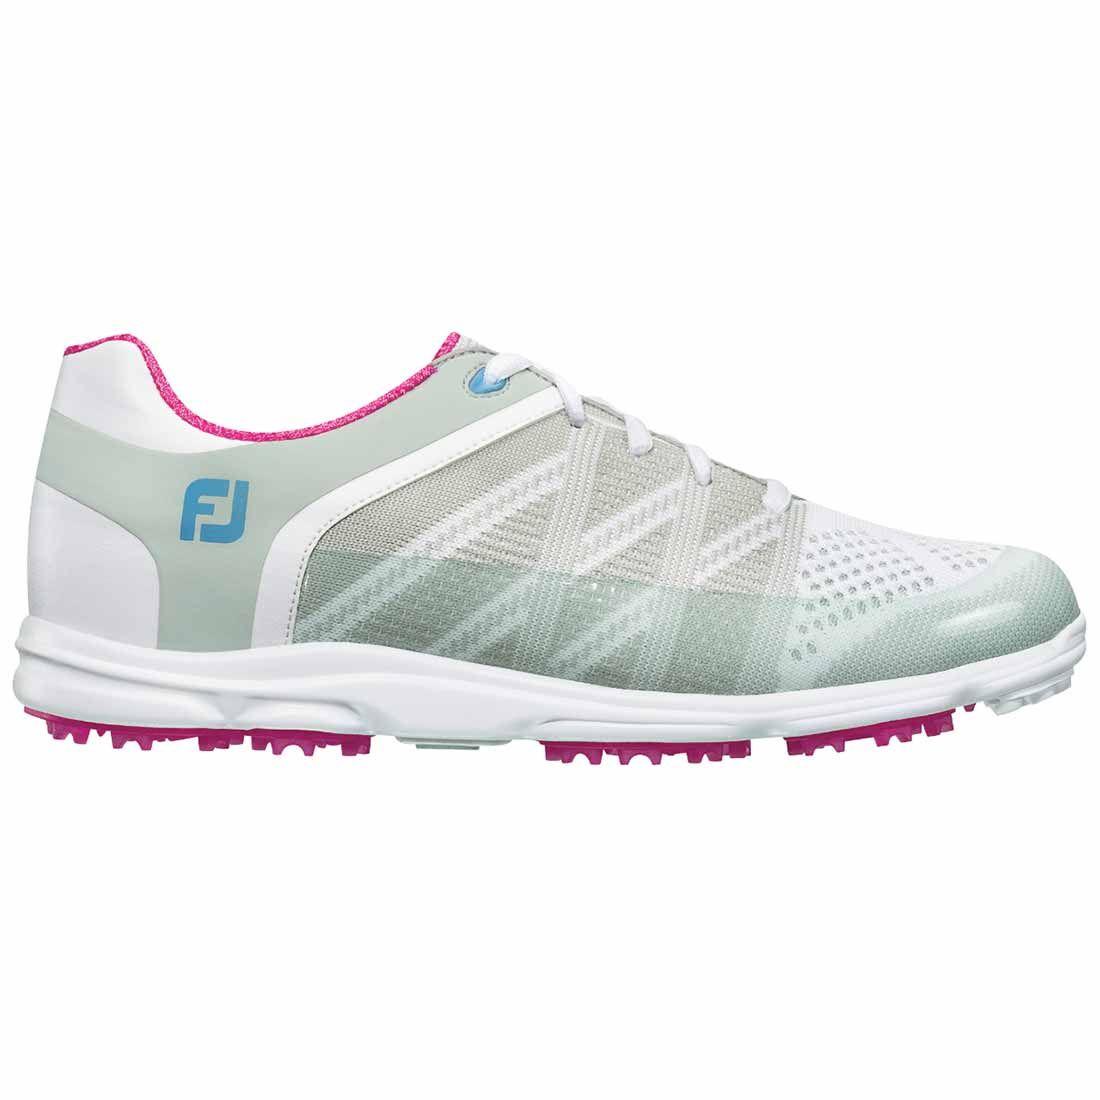 Sport SL Golf Shoes White/Light Grey